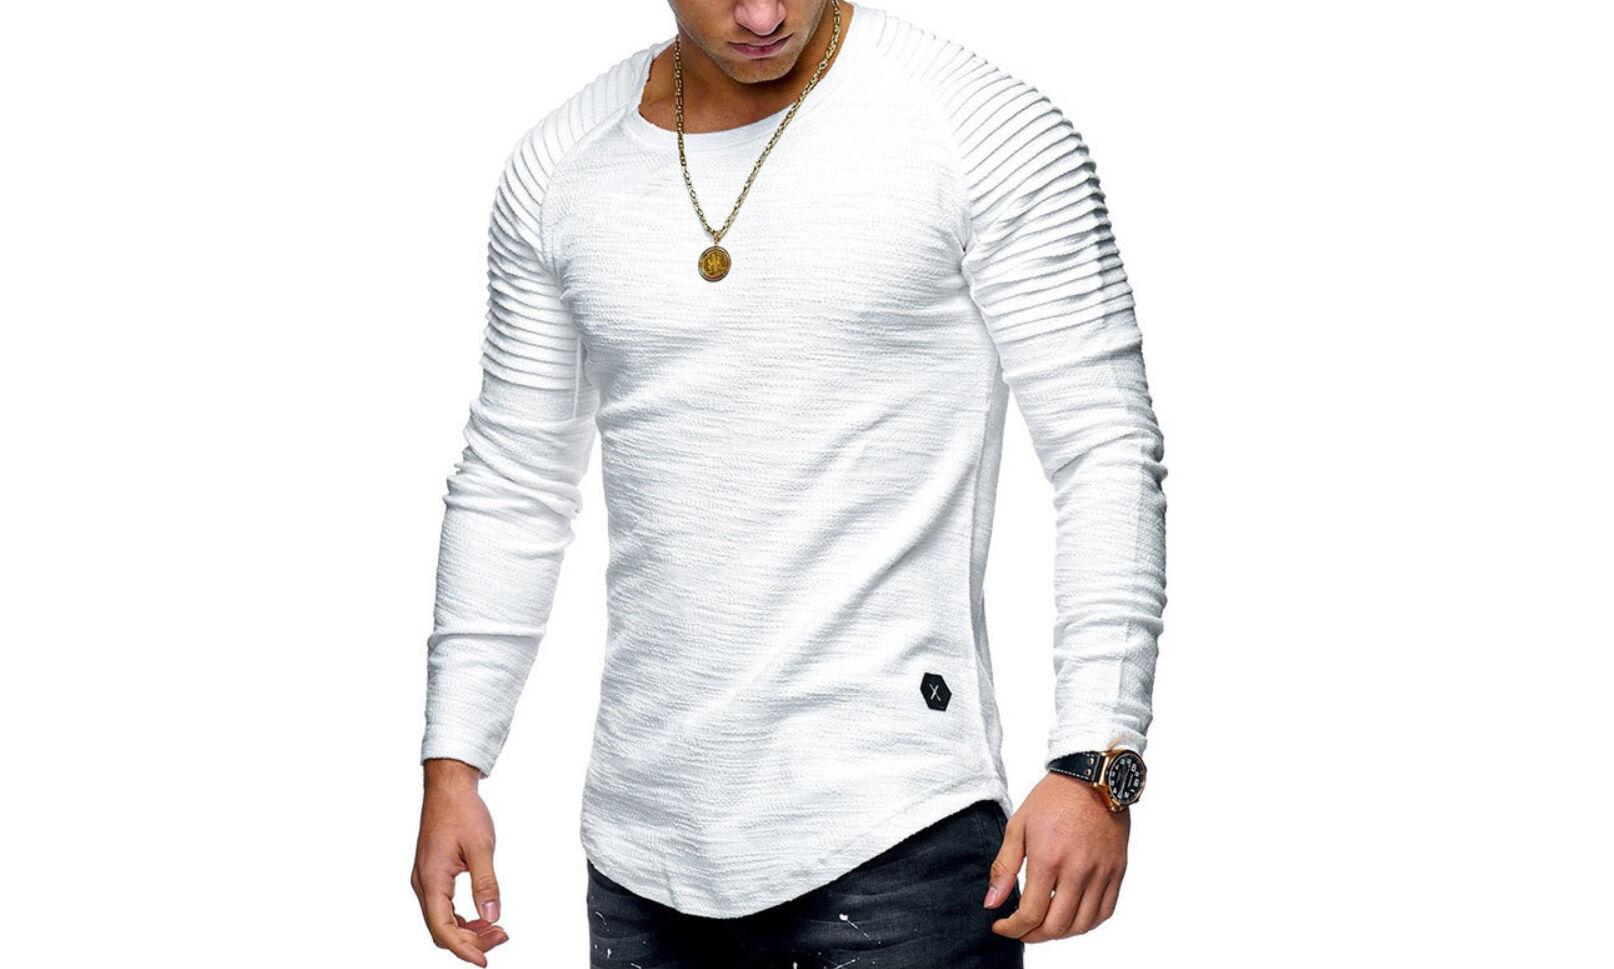 Groupon Goods One Men's Long Sleeve T-Shirt: White / L